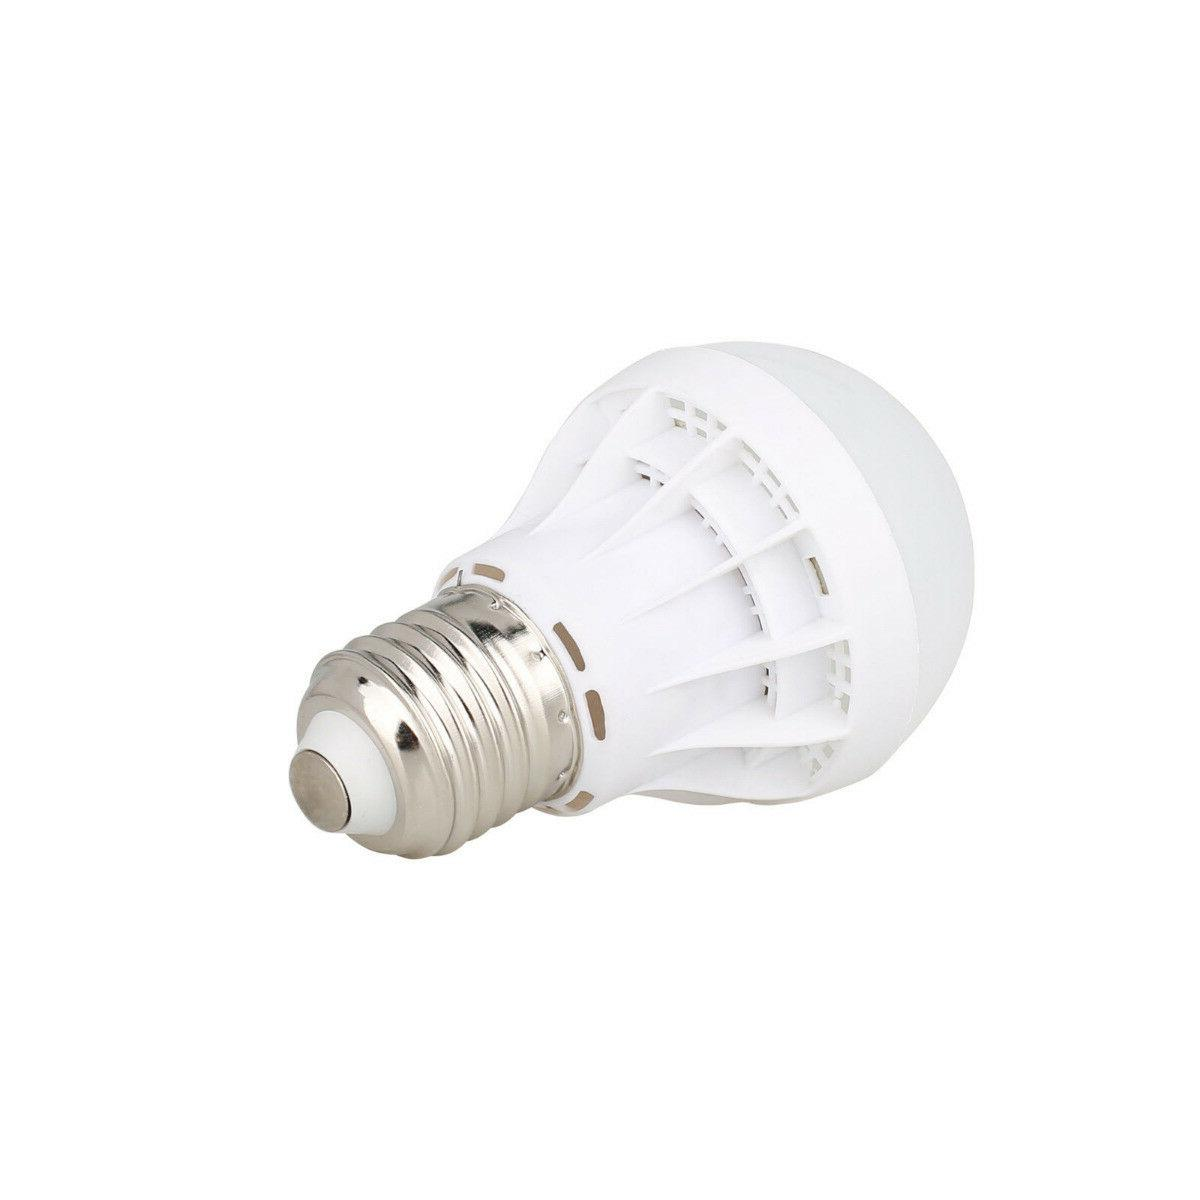 2020 Saving Bulb 5W 9W 15W 110V